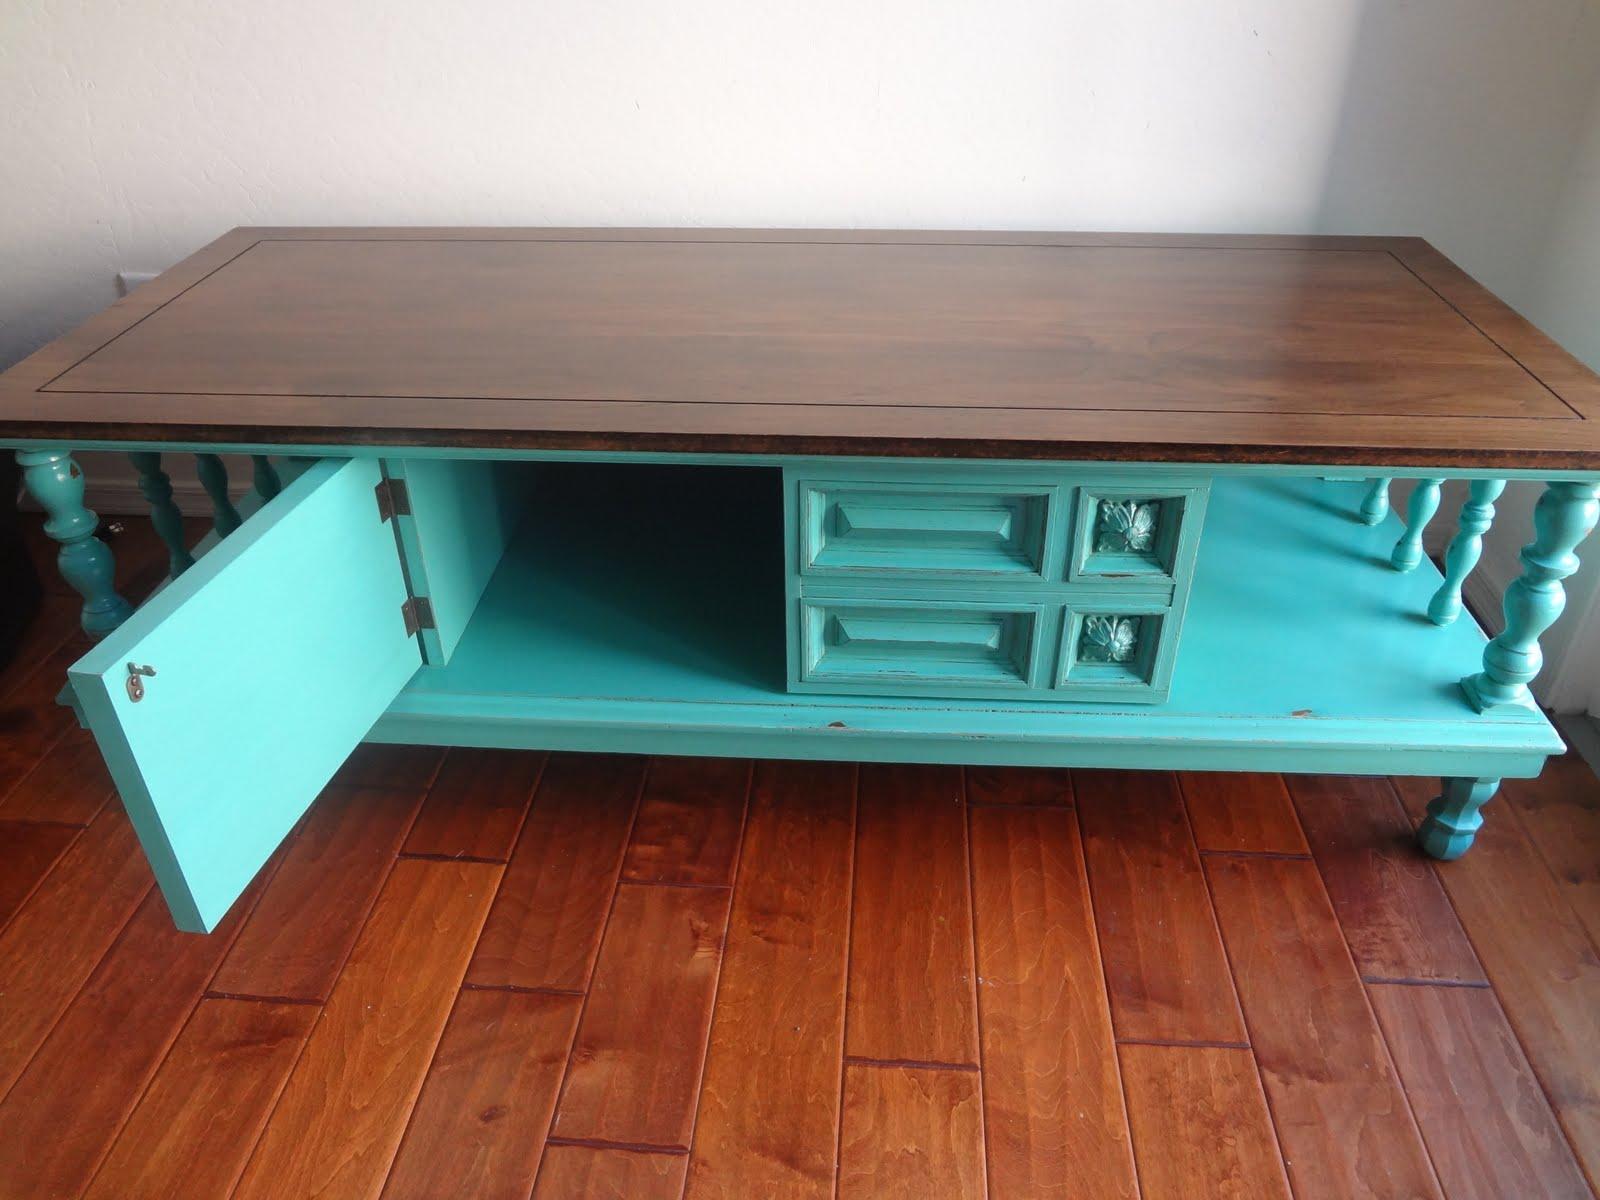 Turquoise Vintage Coffee Table